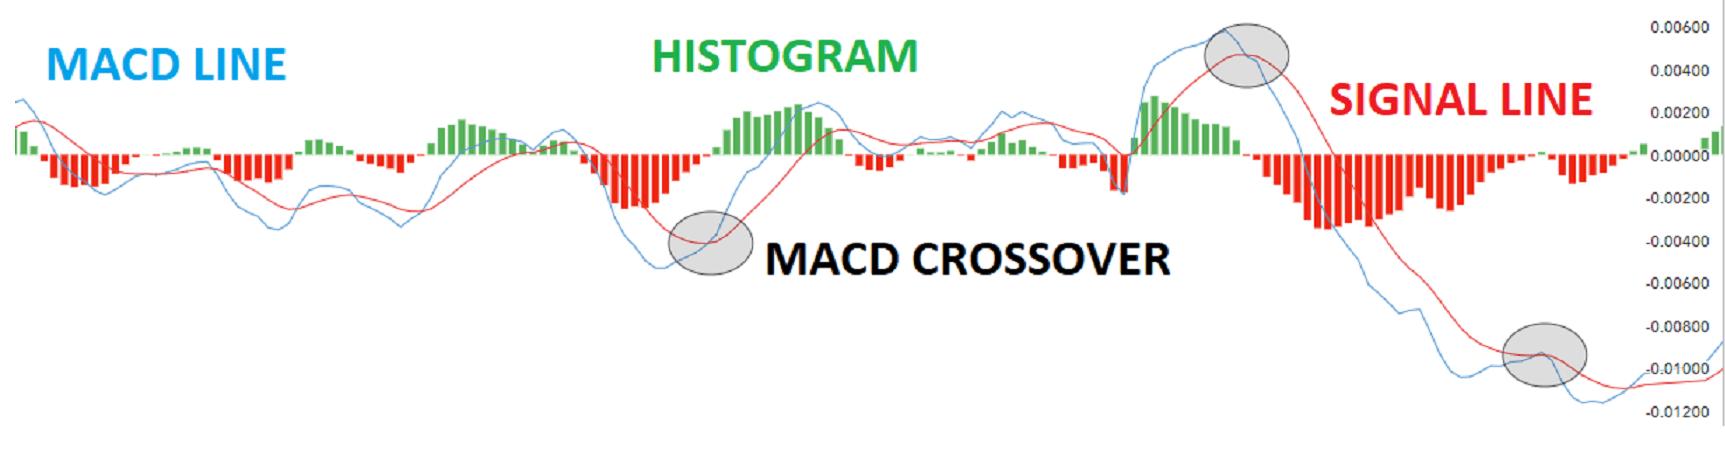 macd crossover prekybos strategija